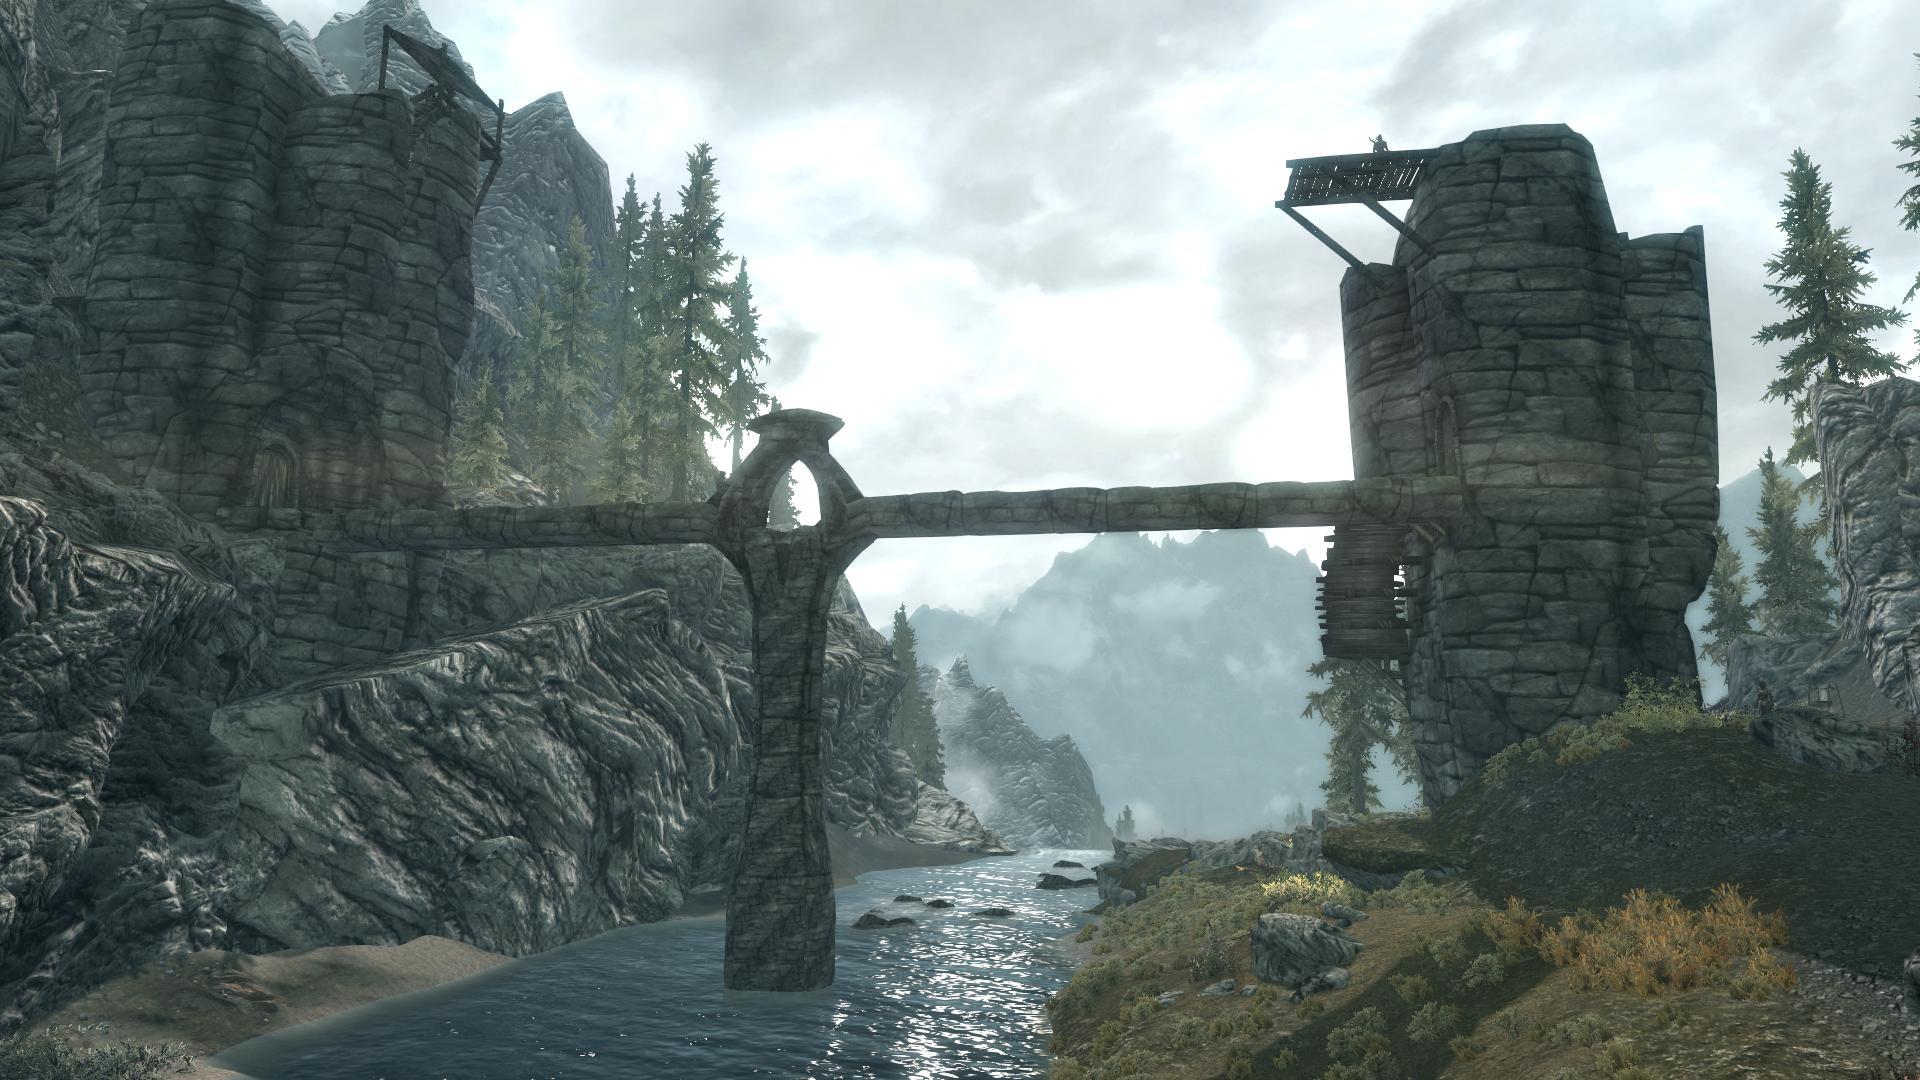 000187.Jpg - Elder Scrolls 5: Skyrim, the